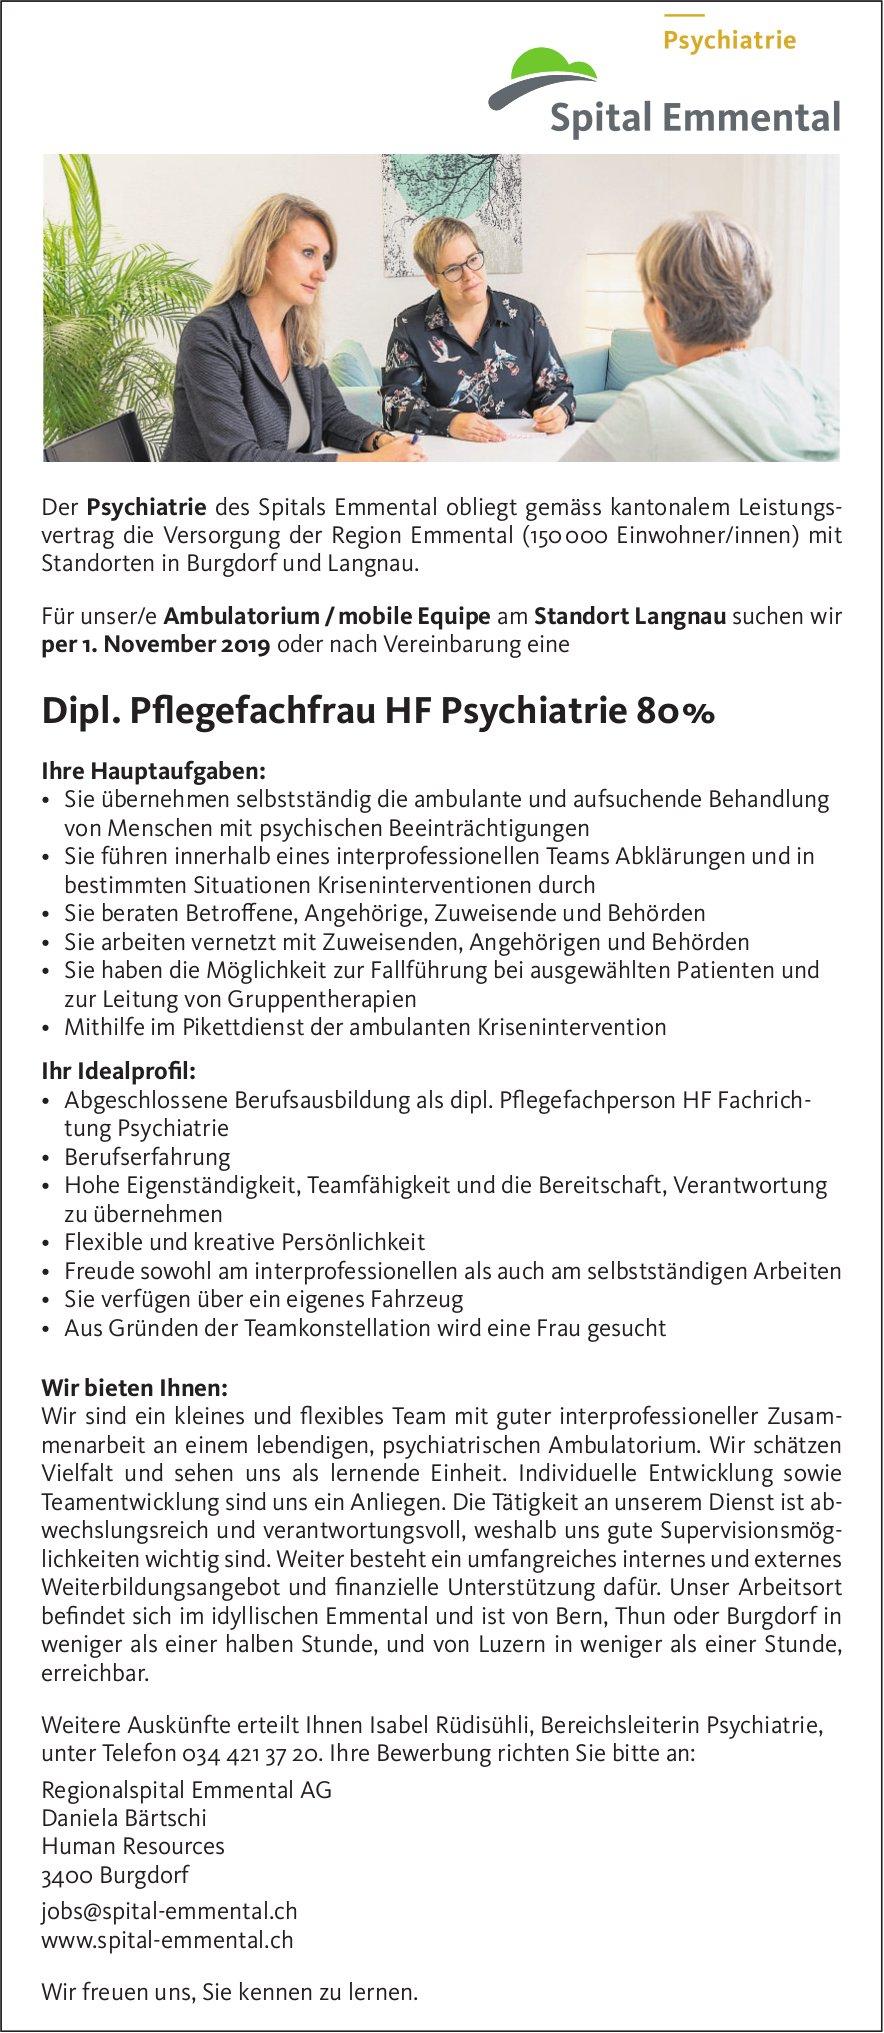 Dipl. Pflegefachfrau HF Psychiatrie 80%, Ambulatorium / mobile Equipe, Langnau, gesucht